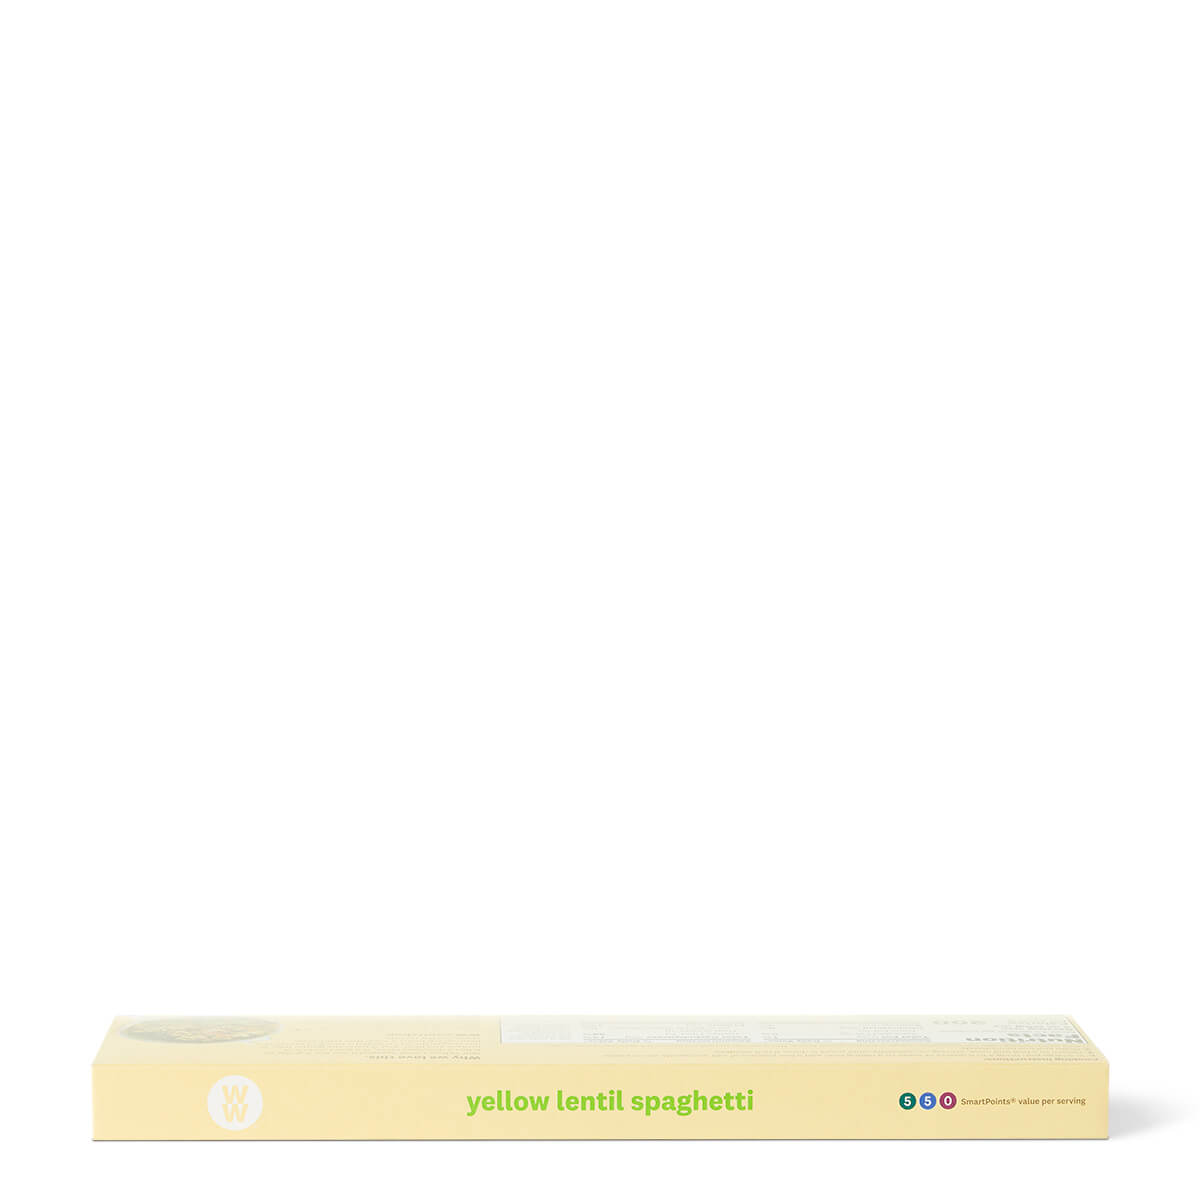 Yellow Lentil Spaghetti - side